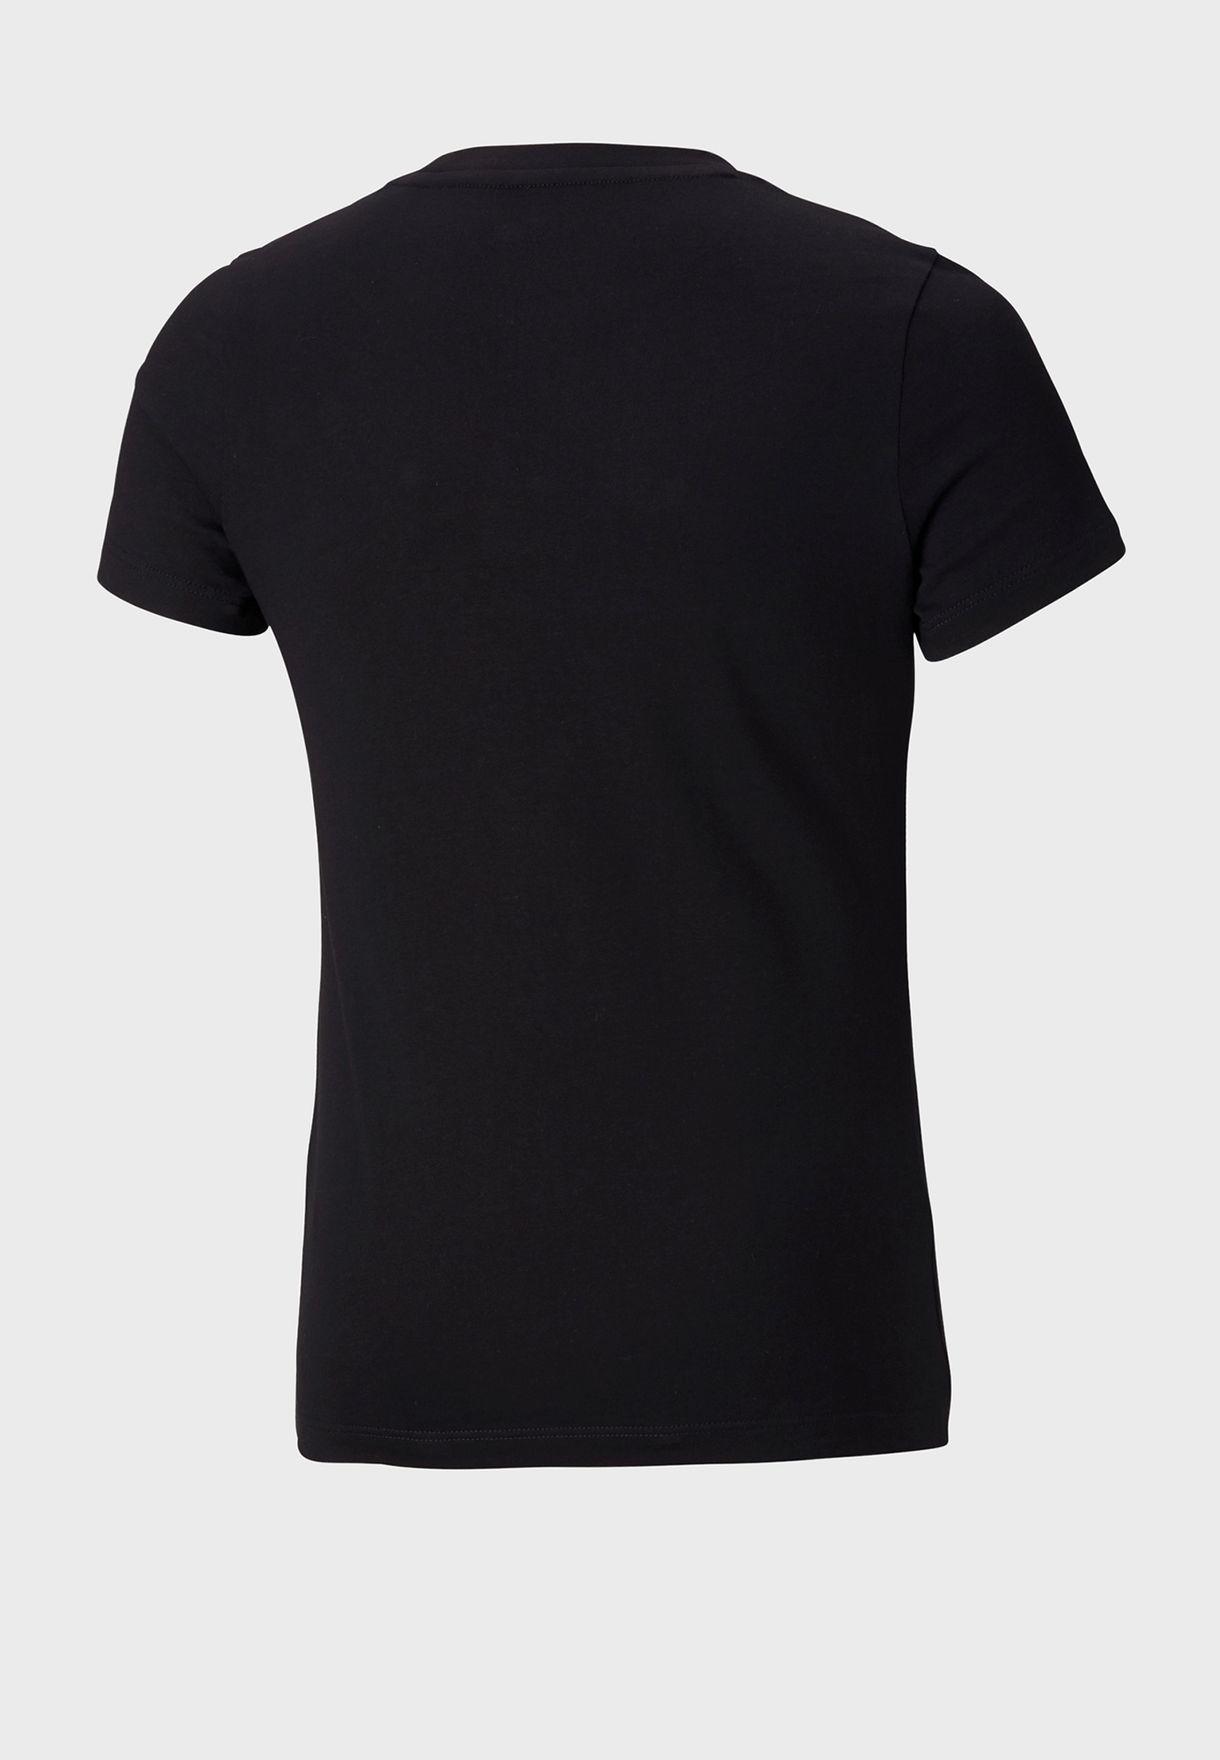 Classics women t-shirt